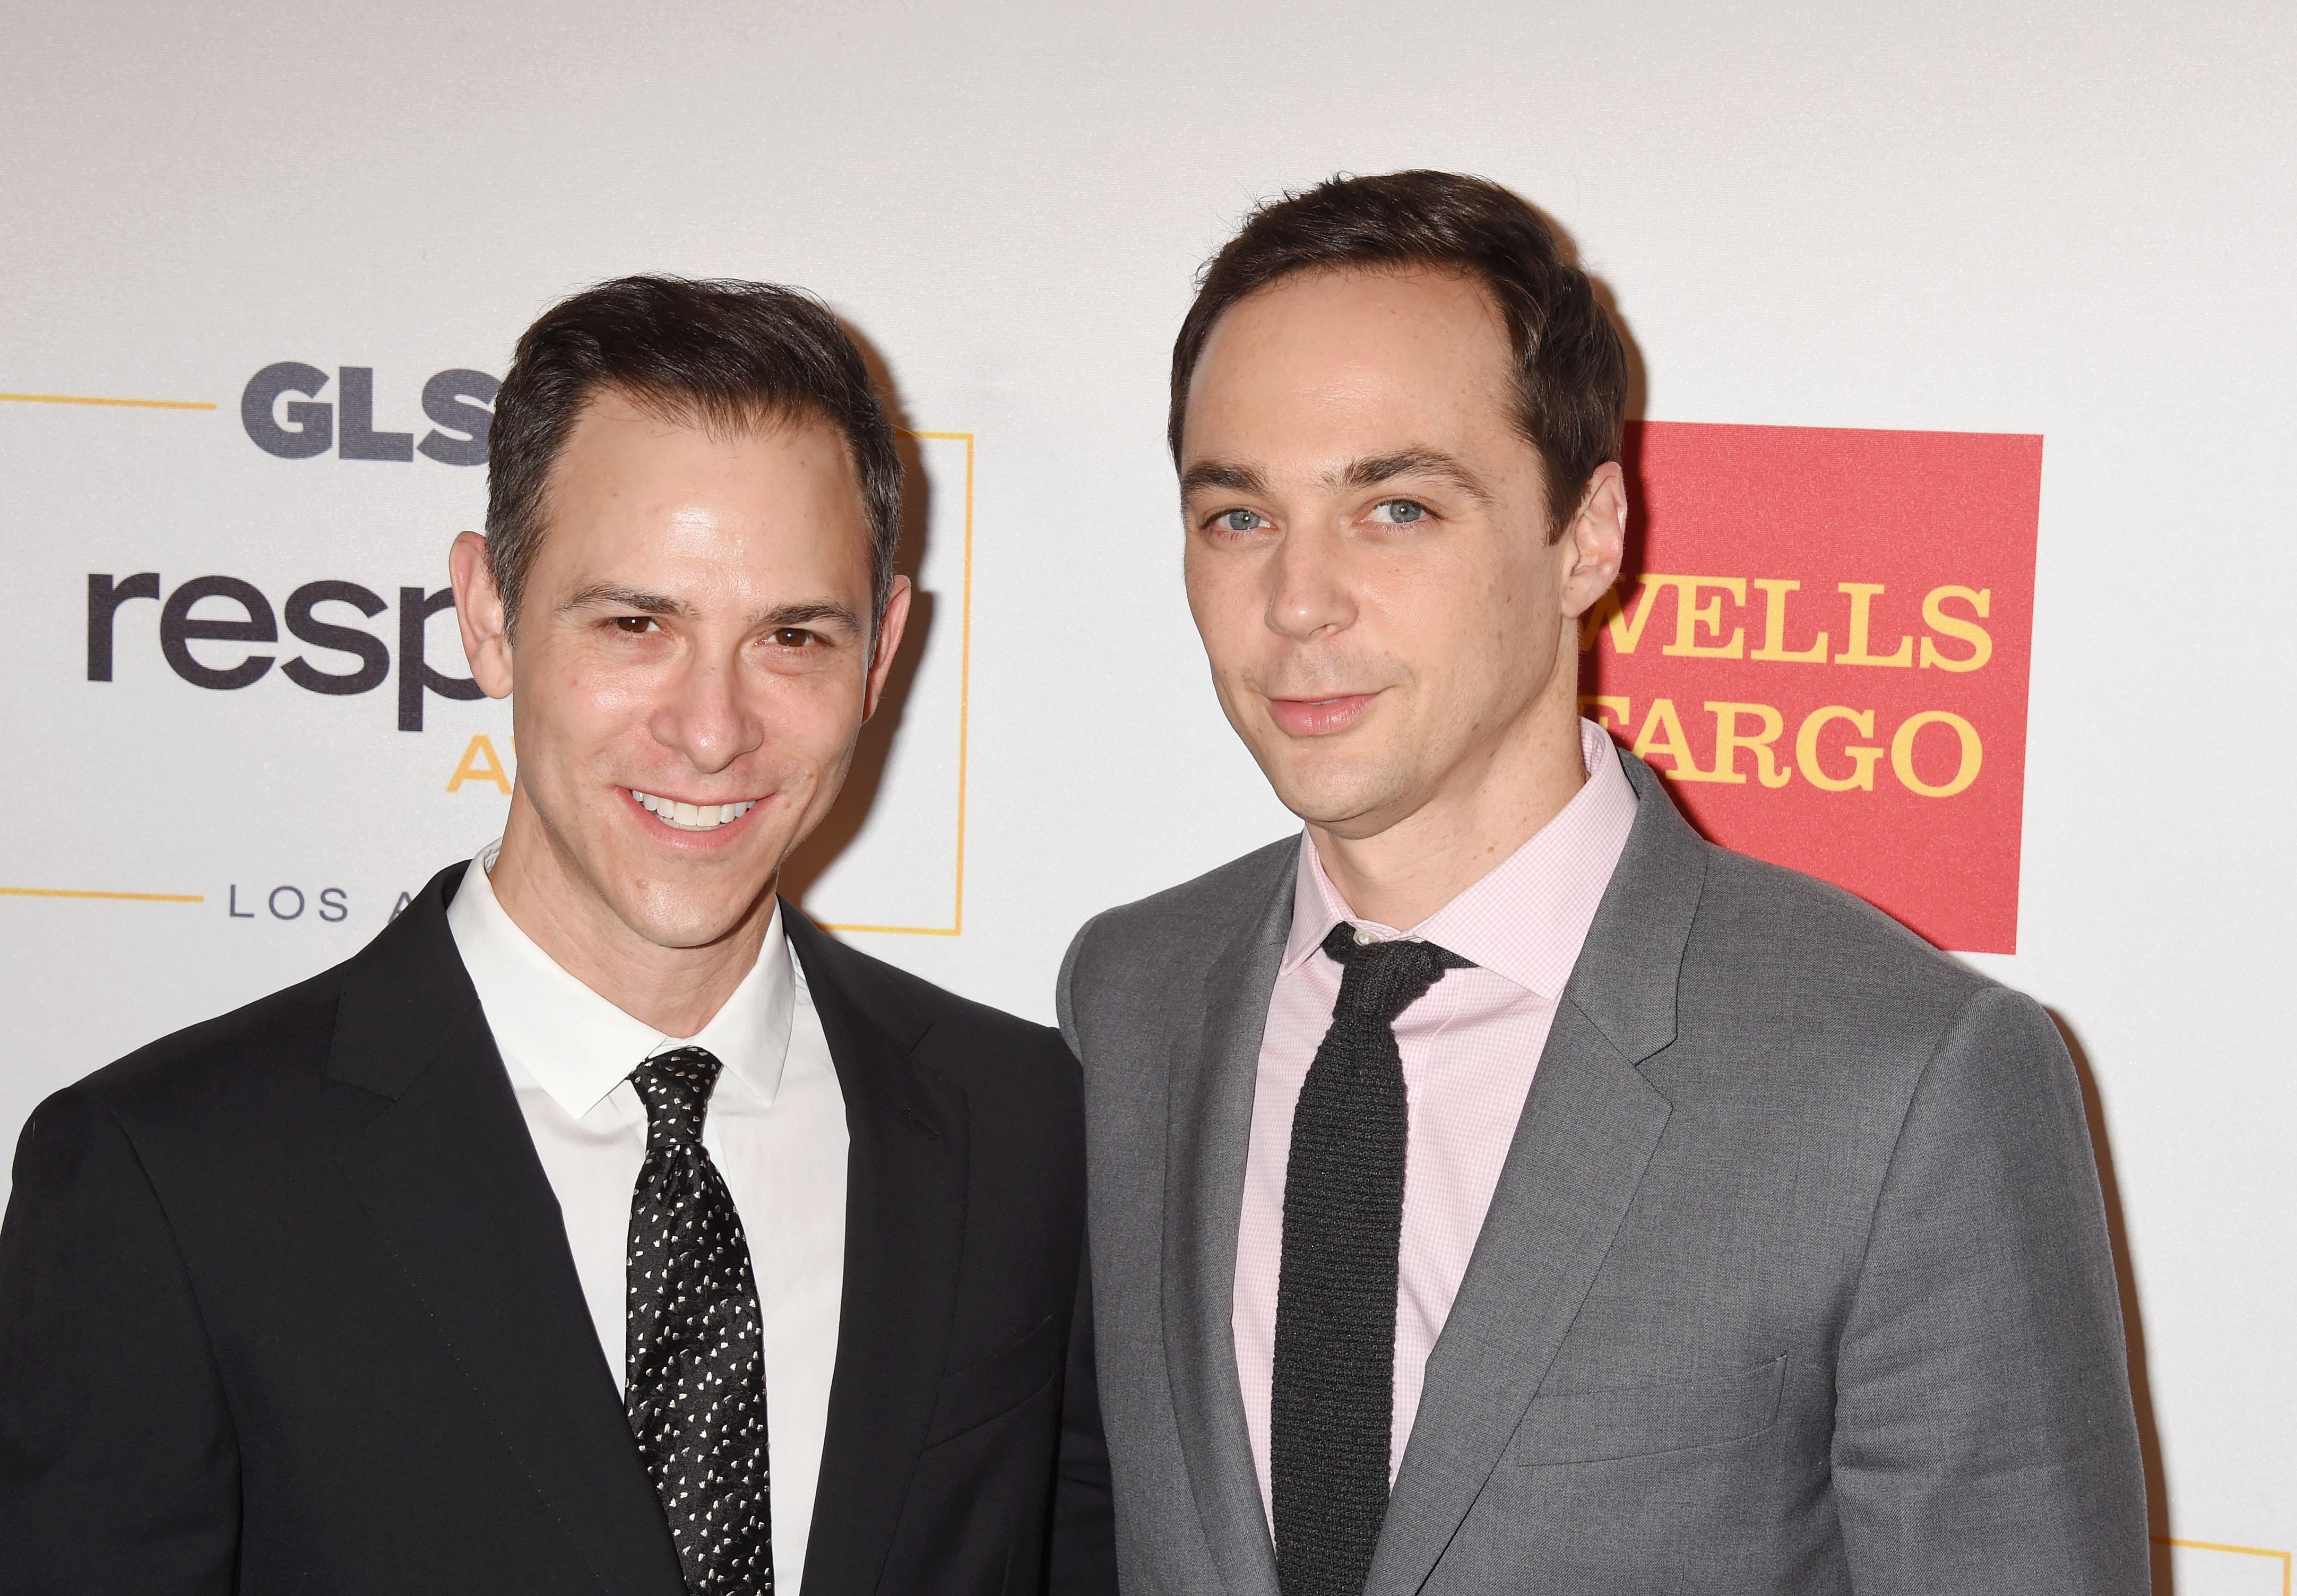 'Big Bang Theory' Star Jim Parsons Marries Longtime Partner Todd